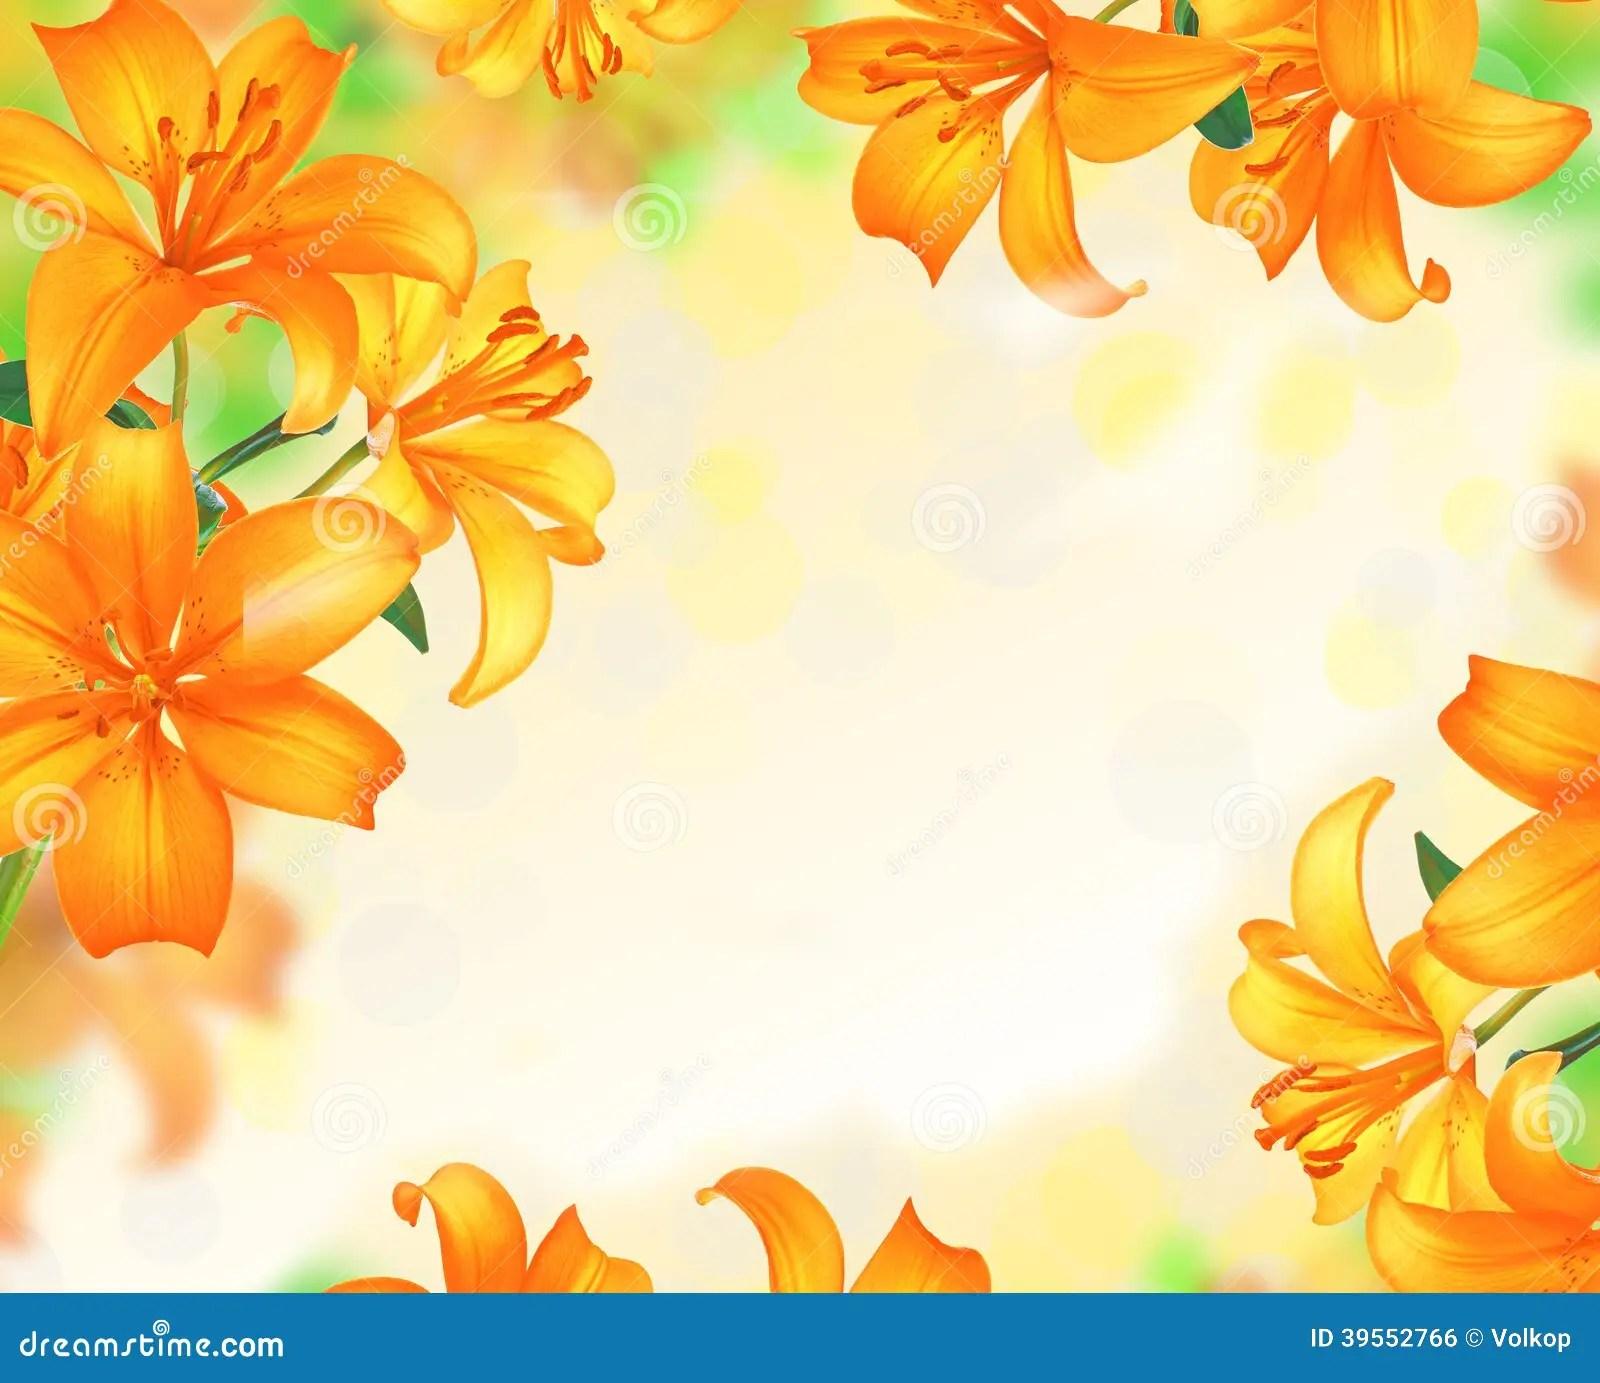 Lily Flowers Border Design Stock Photo